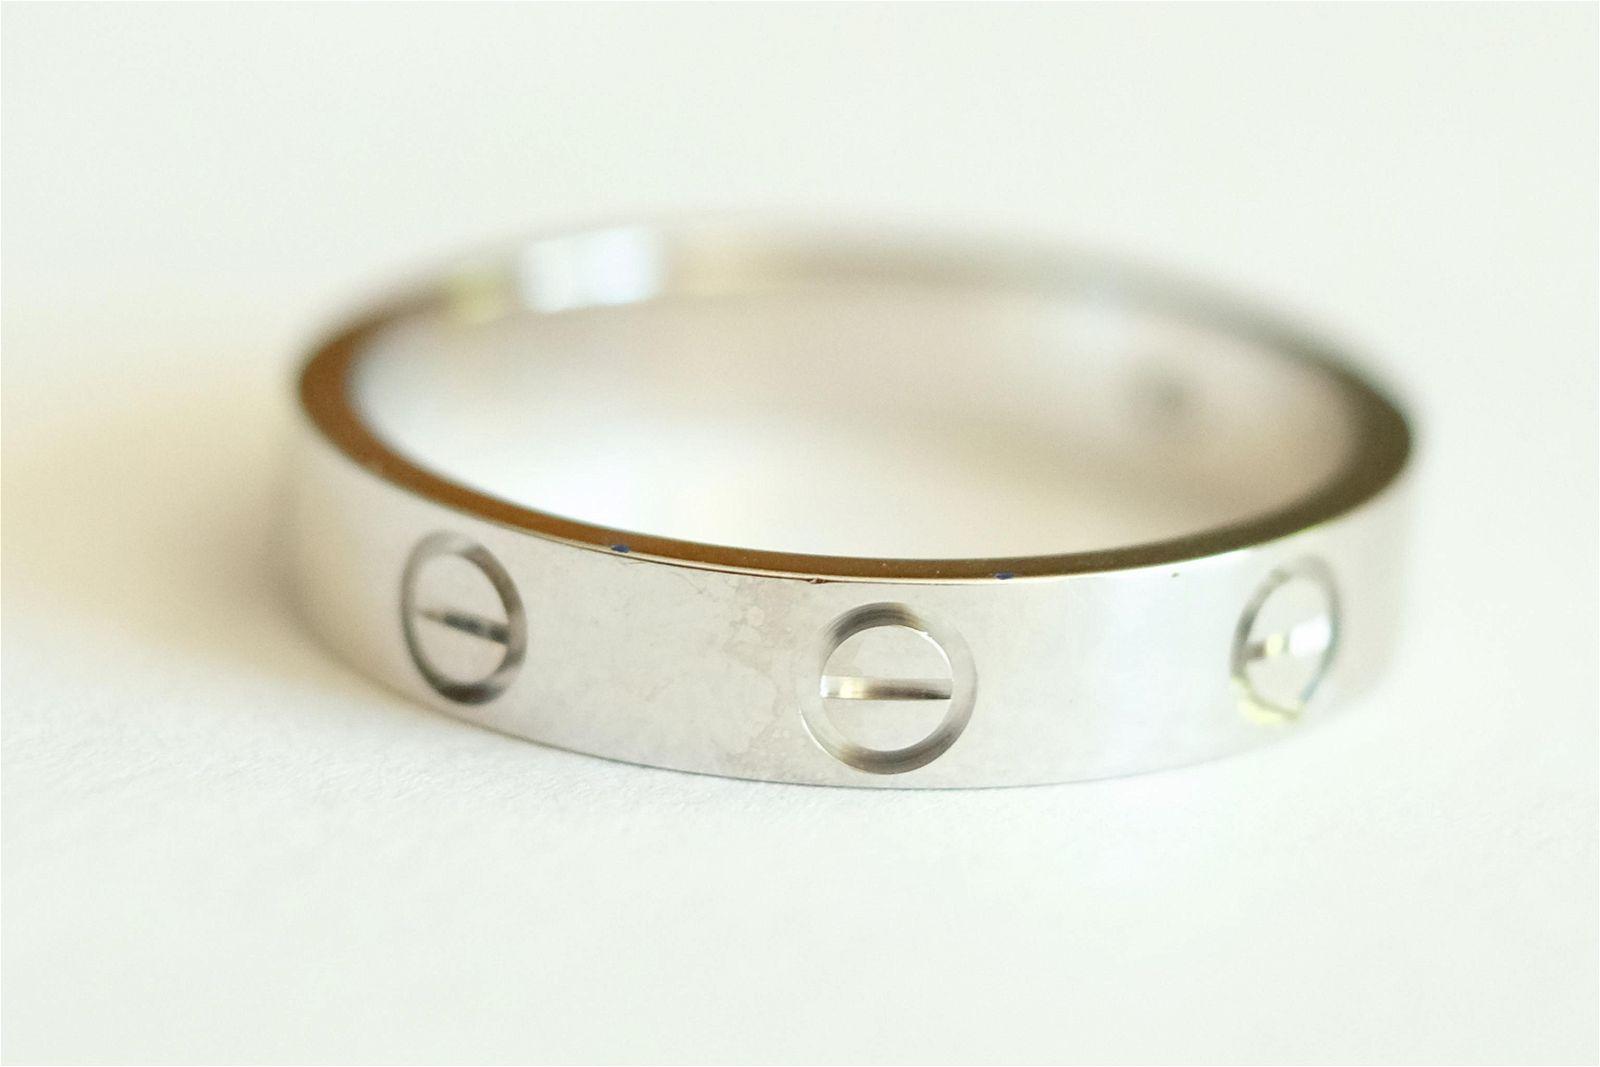 18K WG Diamond LOVE Ring Band Size 8